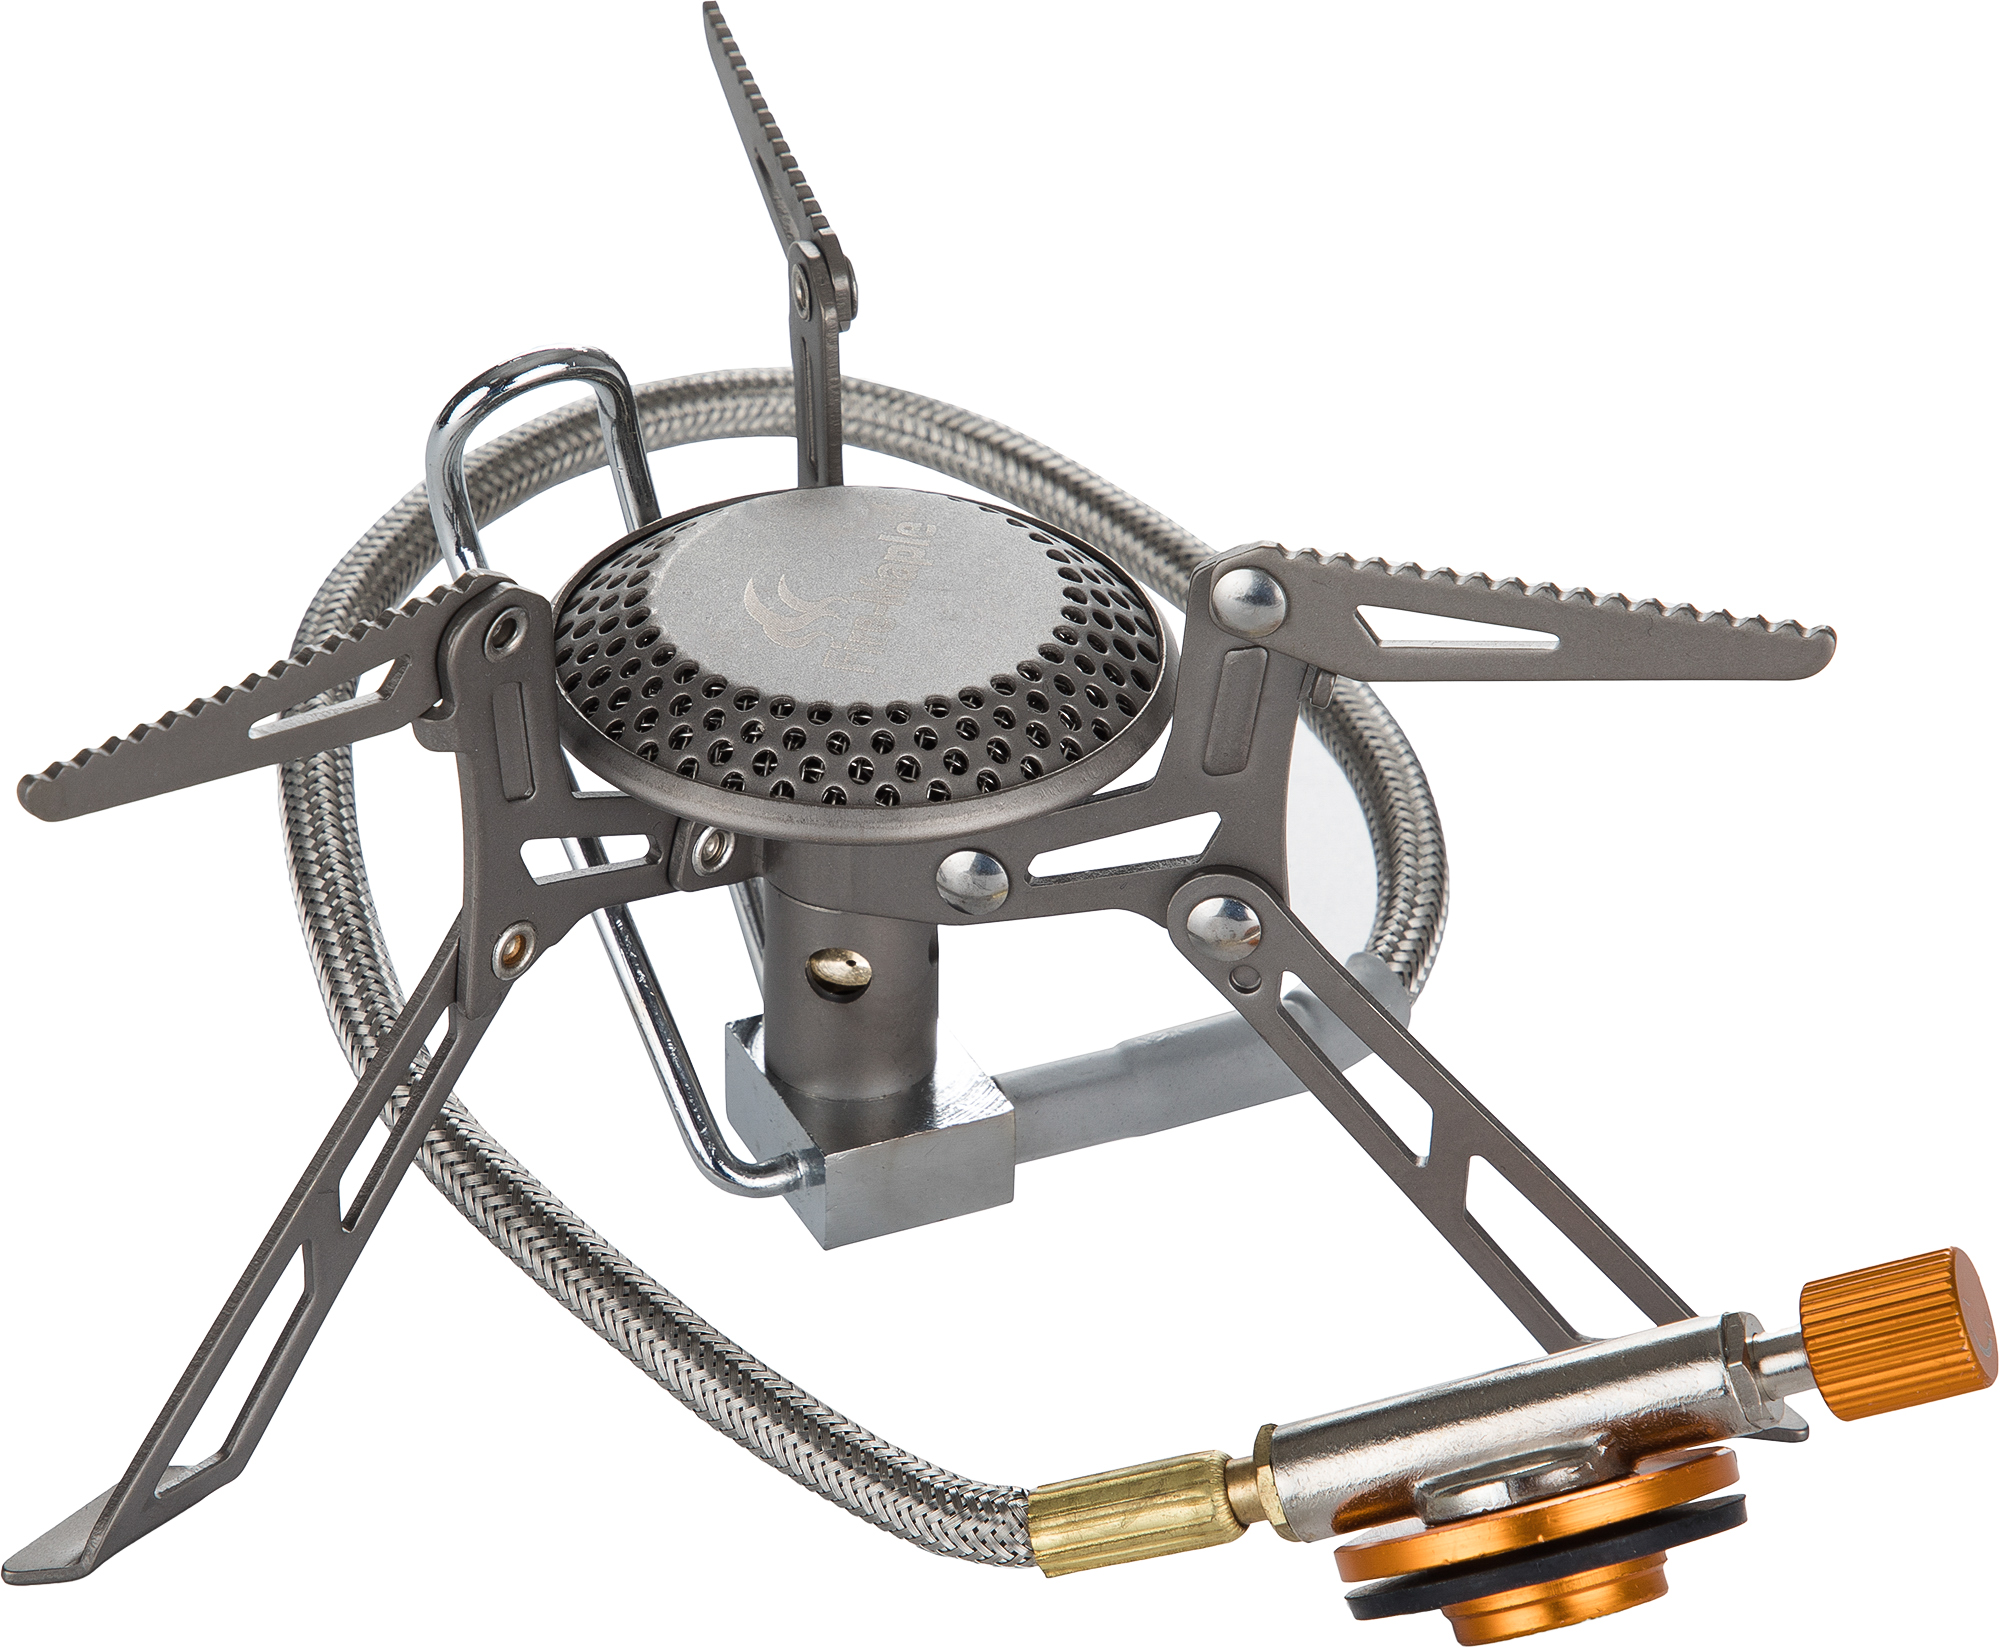 Fire-Maple Горелка газовая портативная BLADE 2